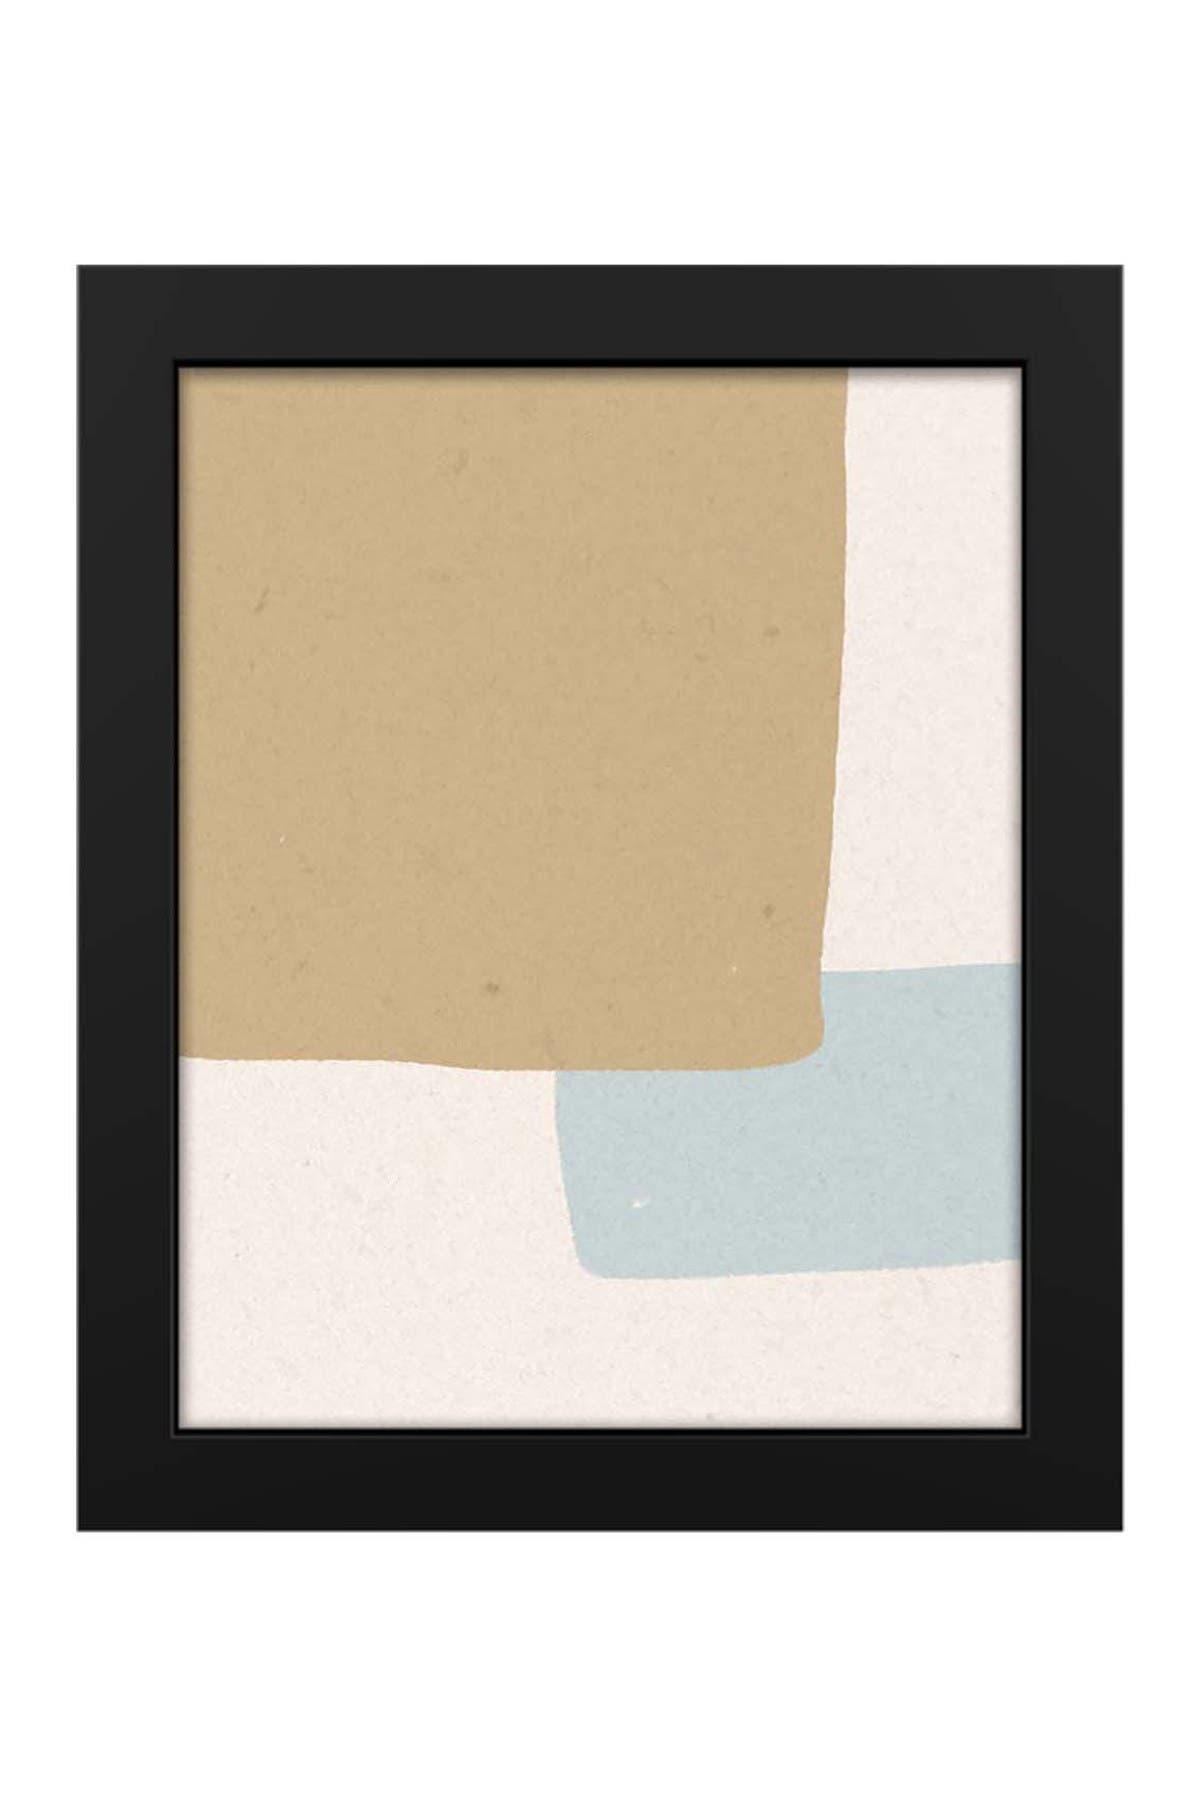 "Image of PTM Images Chocolate Bar 19""x23"" Framed MDF Canvas"